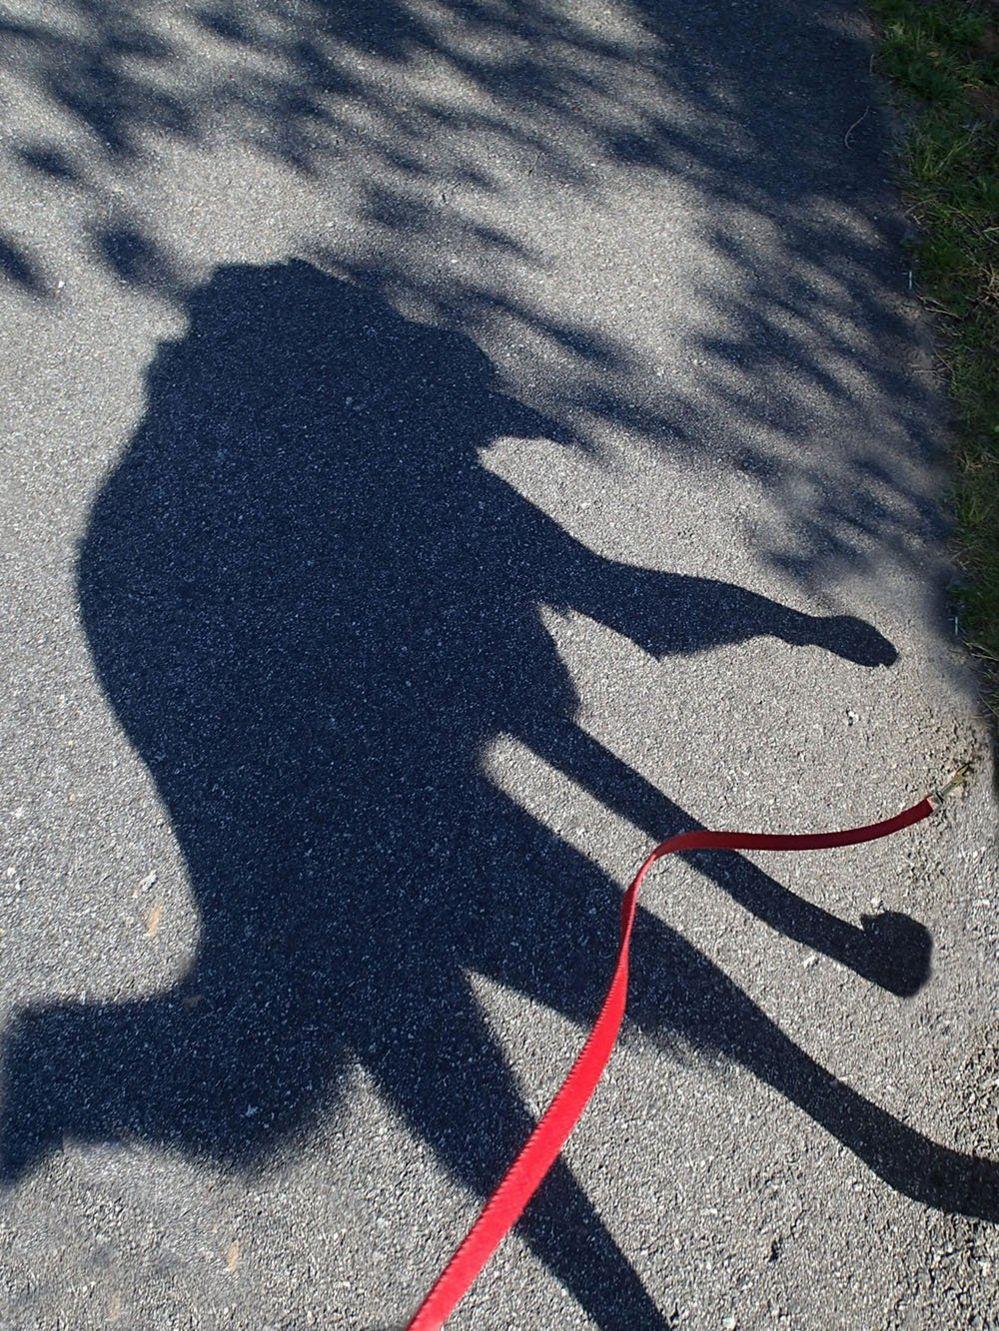 Shadow of a dog